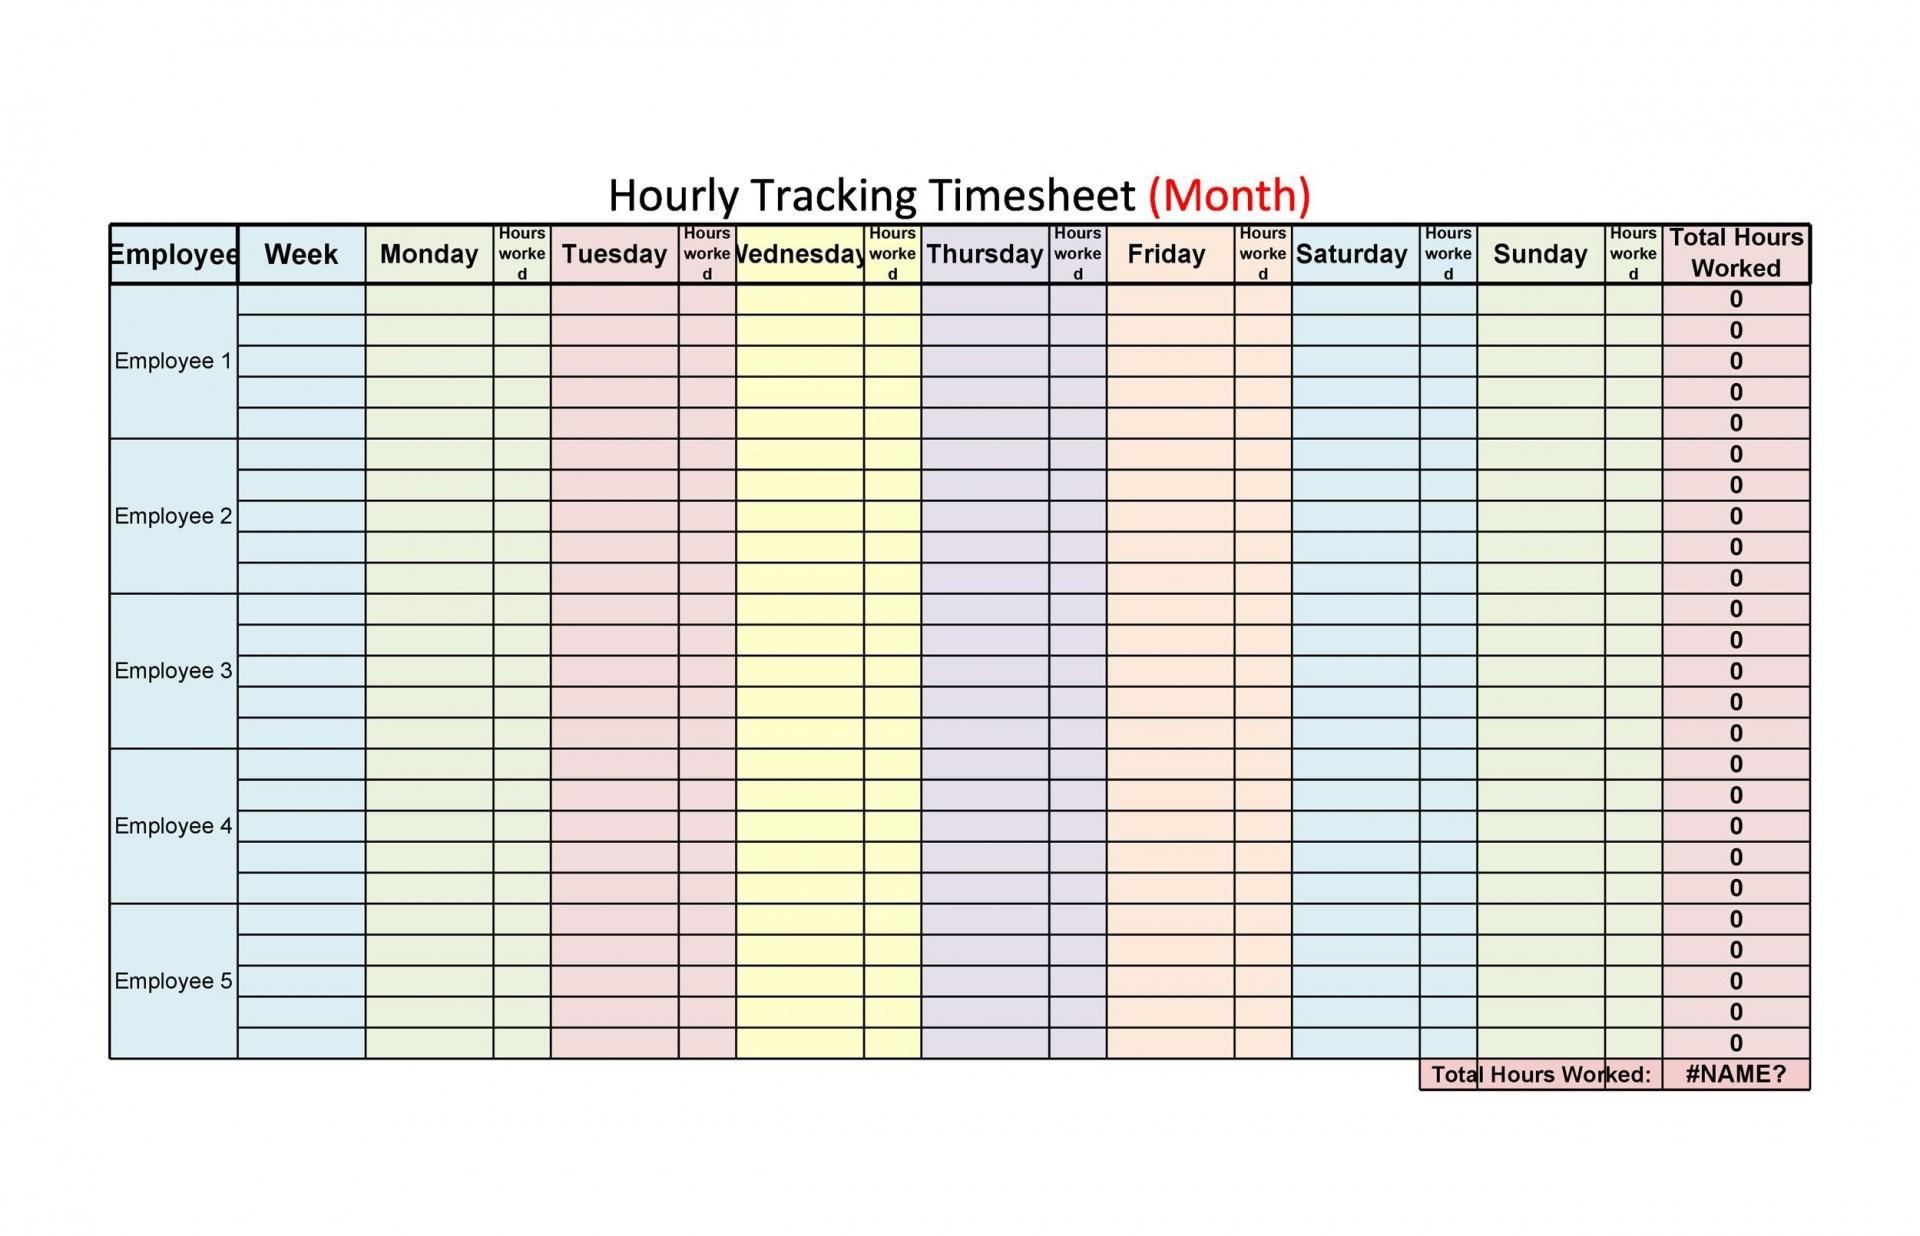 009 Unbelievable Hourly Work Schedule Template Word High Def 1920